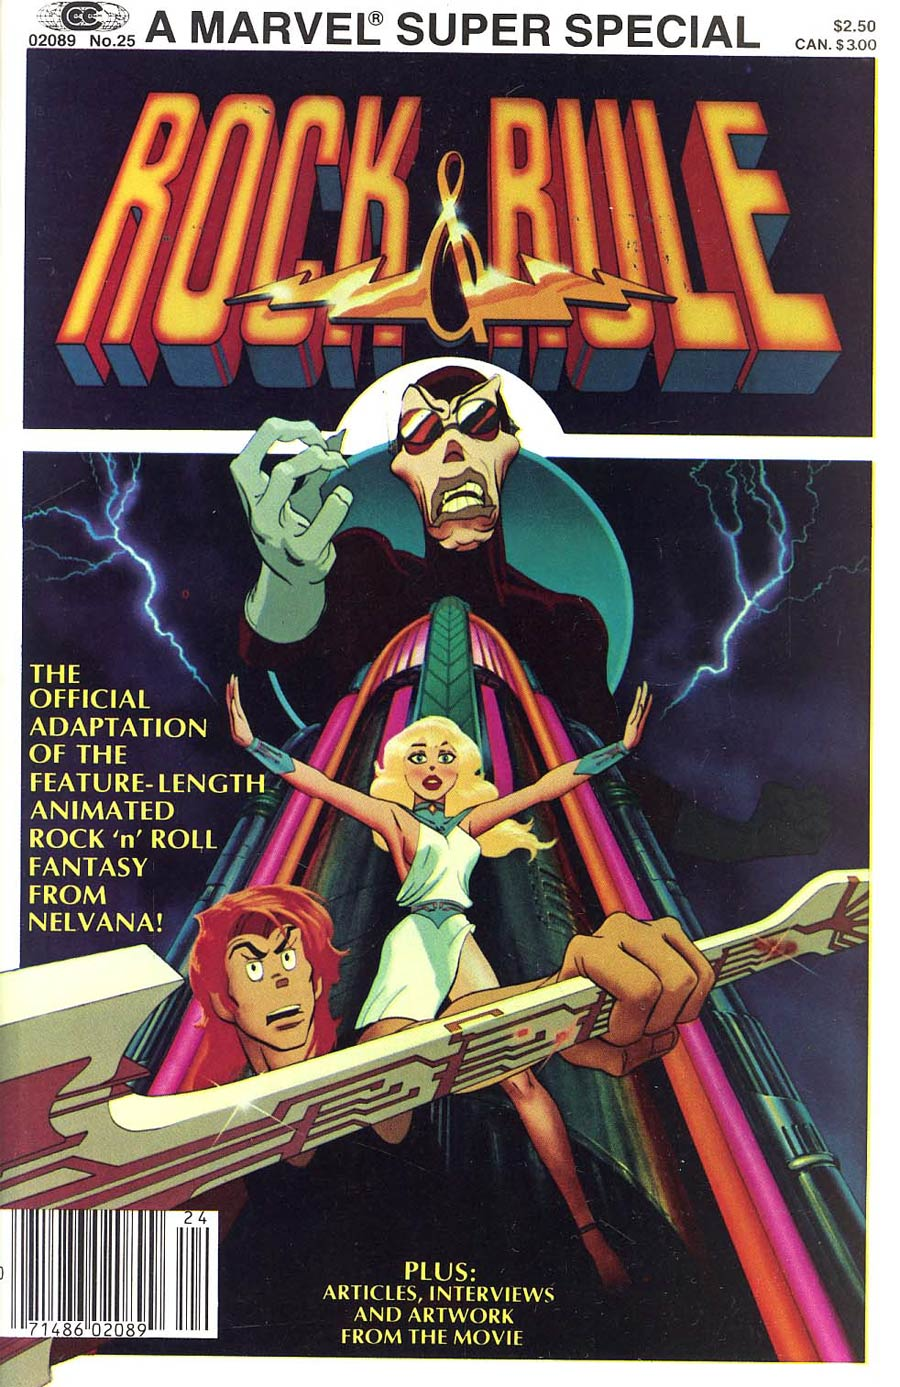 Marvel Comics Super Special Magazine #25 Comic Sized Edition